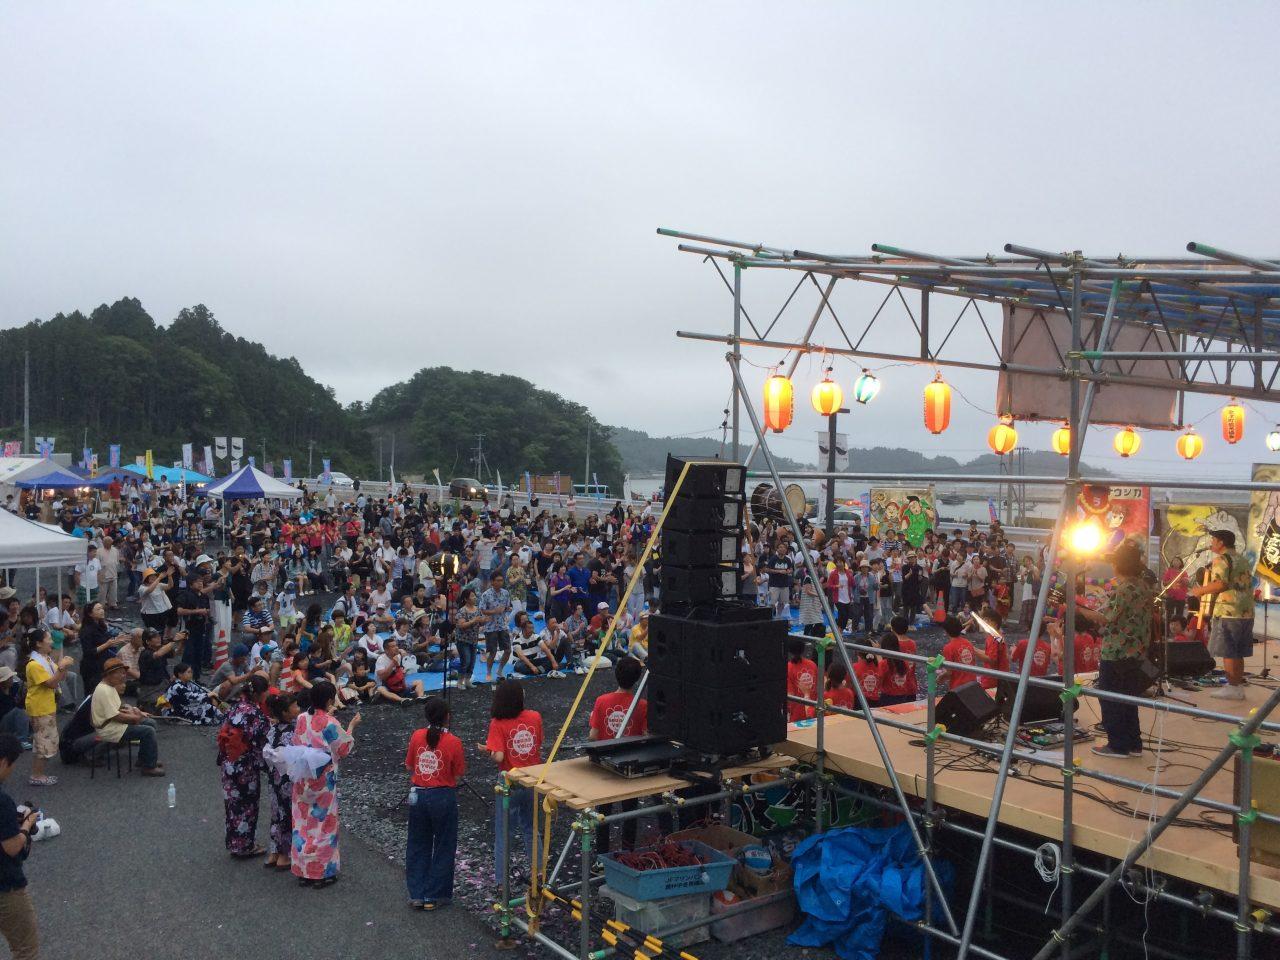 utatsu-summer-fes-2017-01